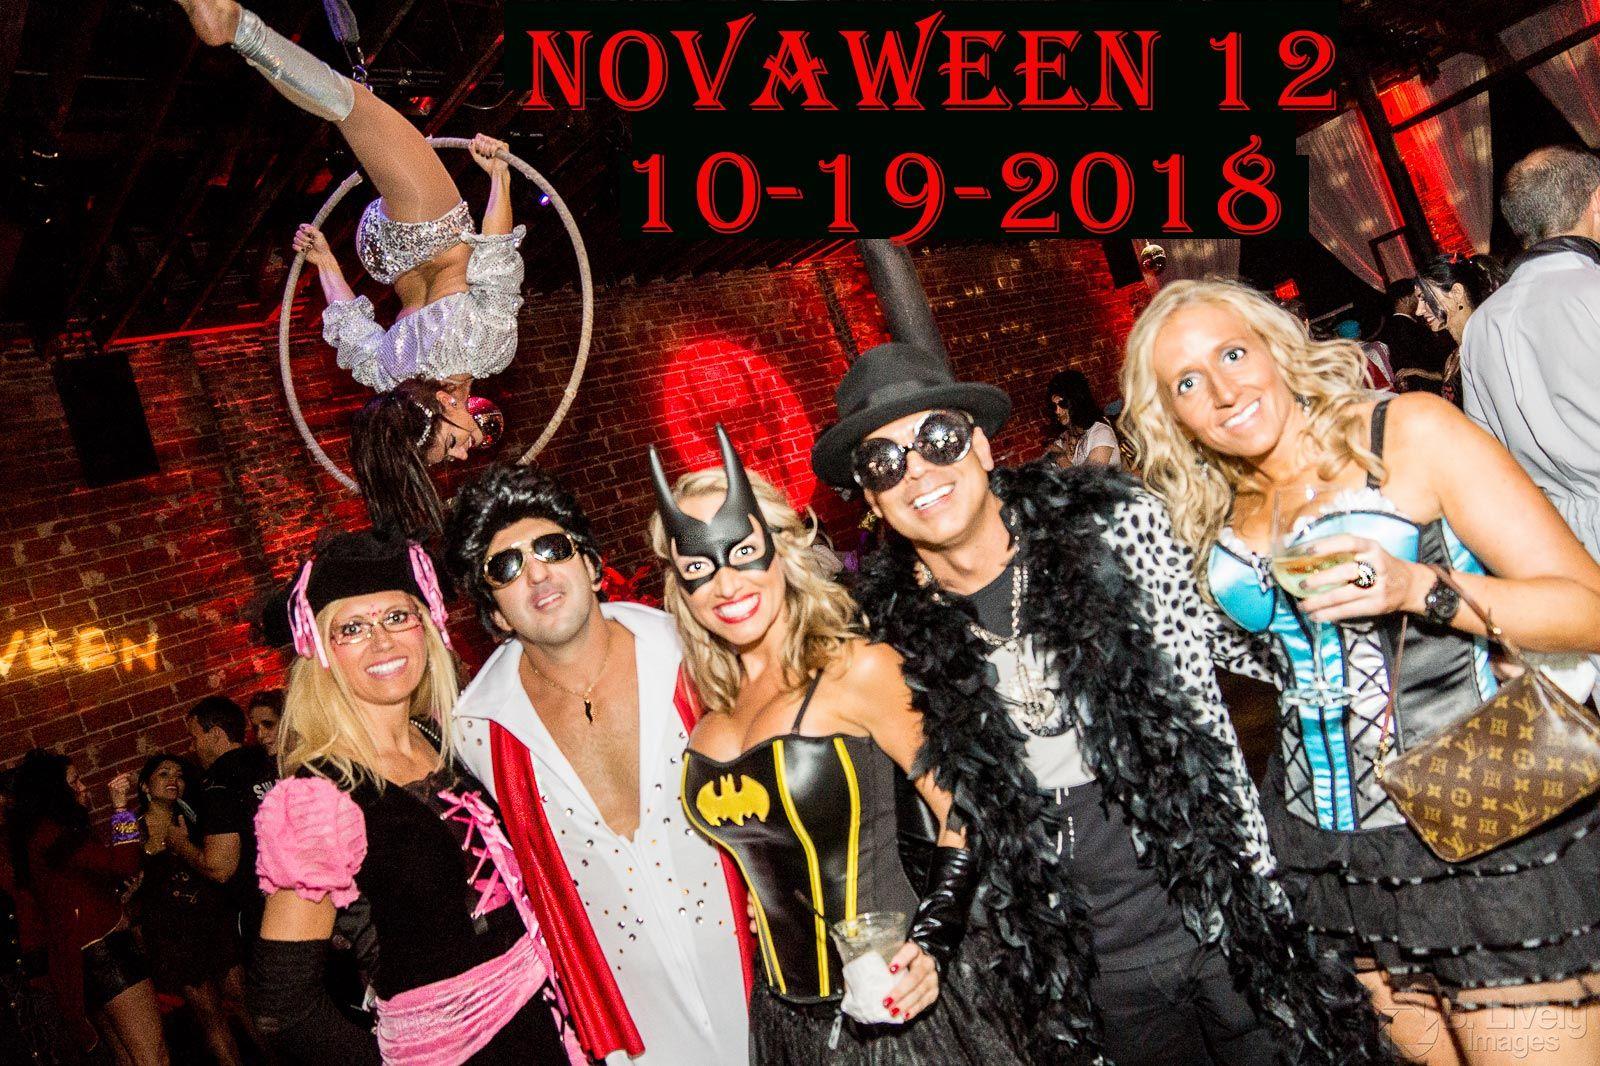 2018 10-19 Friday is Novaween 12 at Historic downtown St. Pete venue NOVA 535